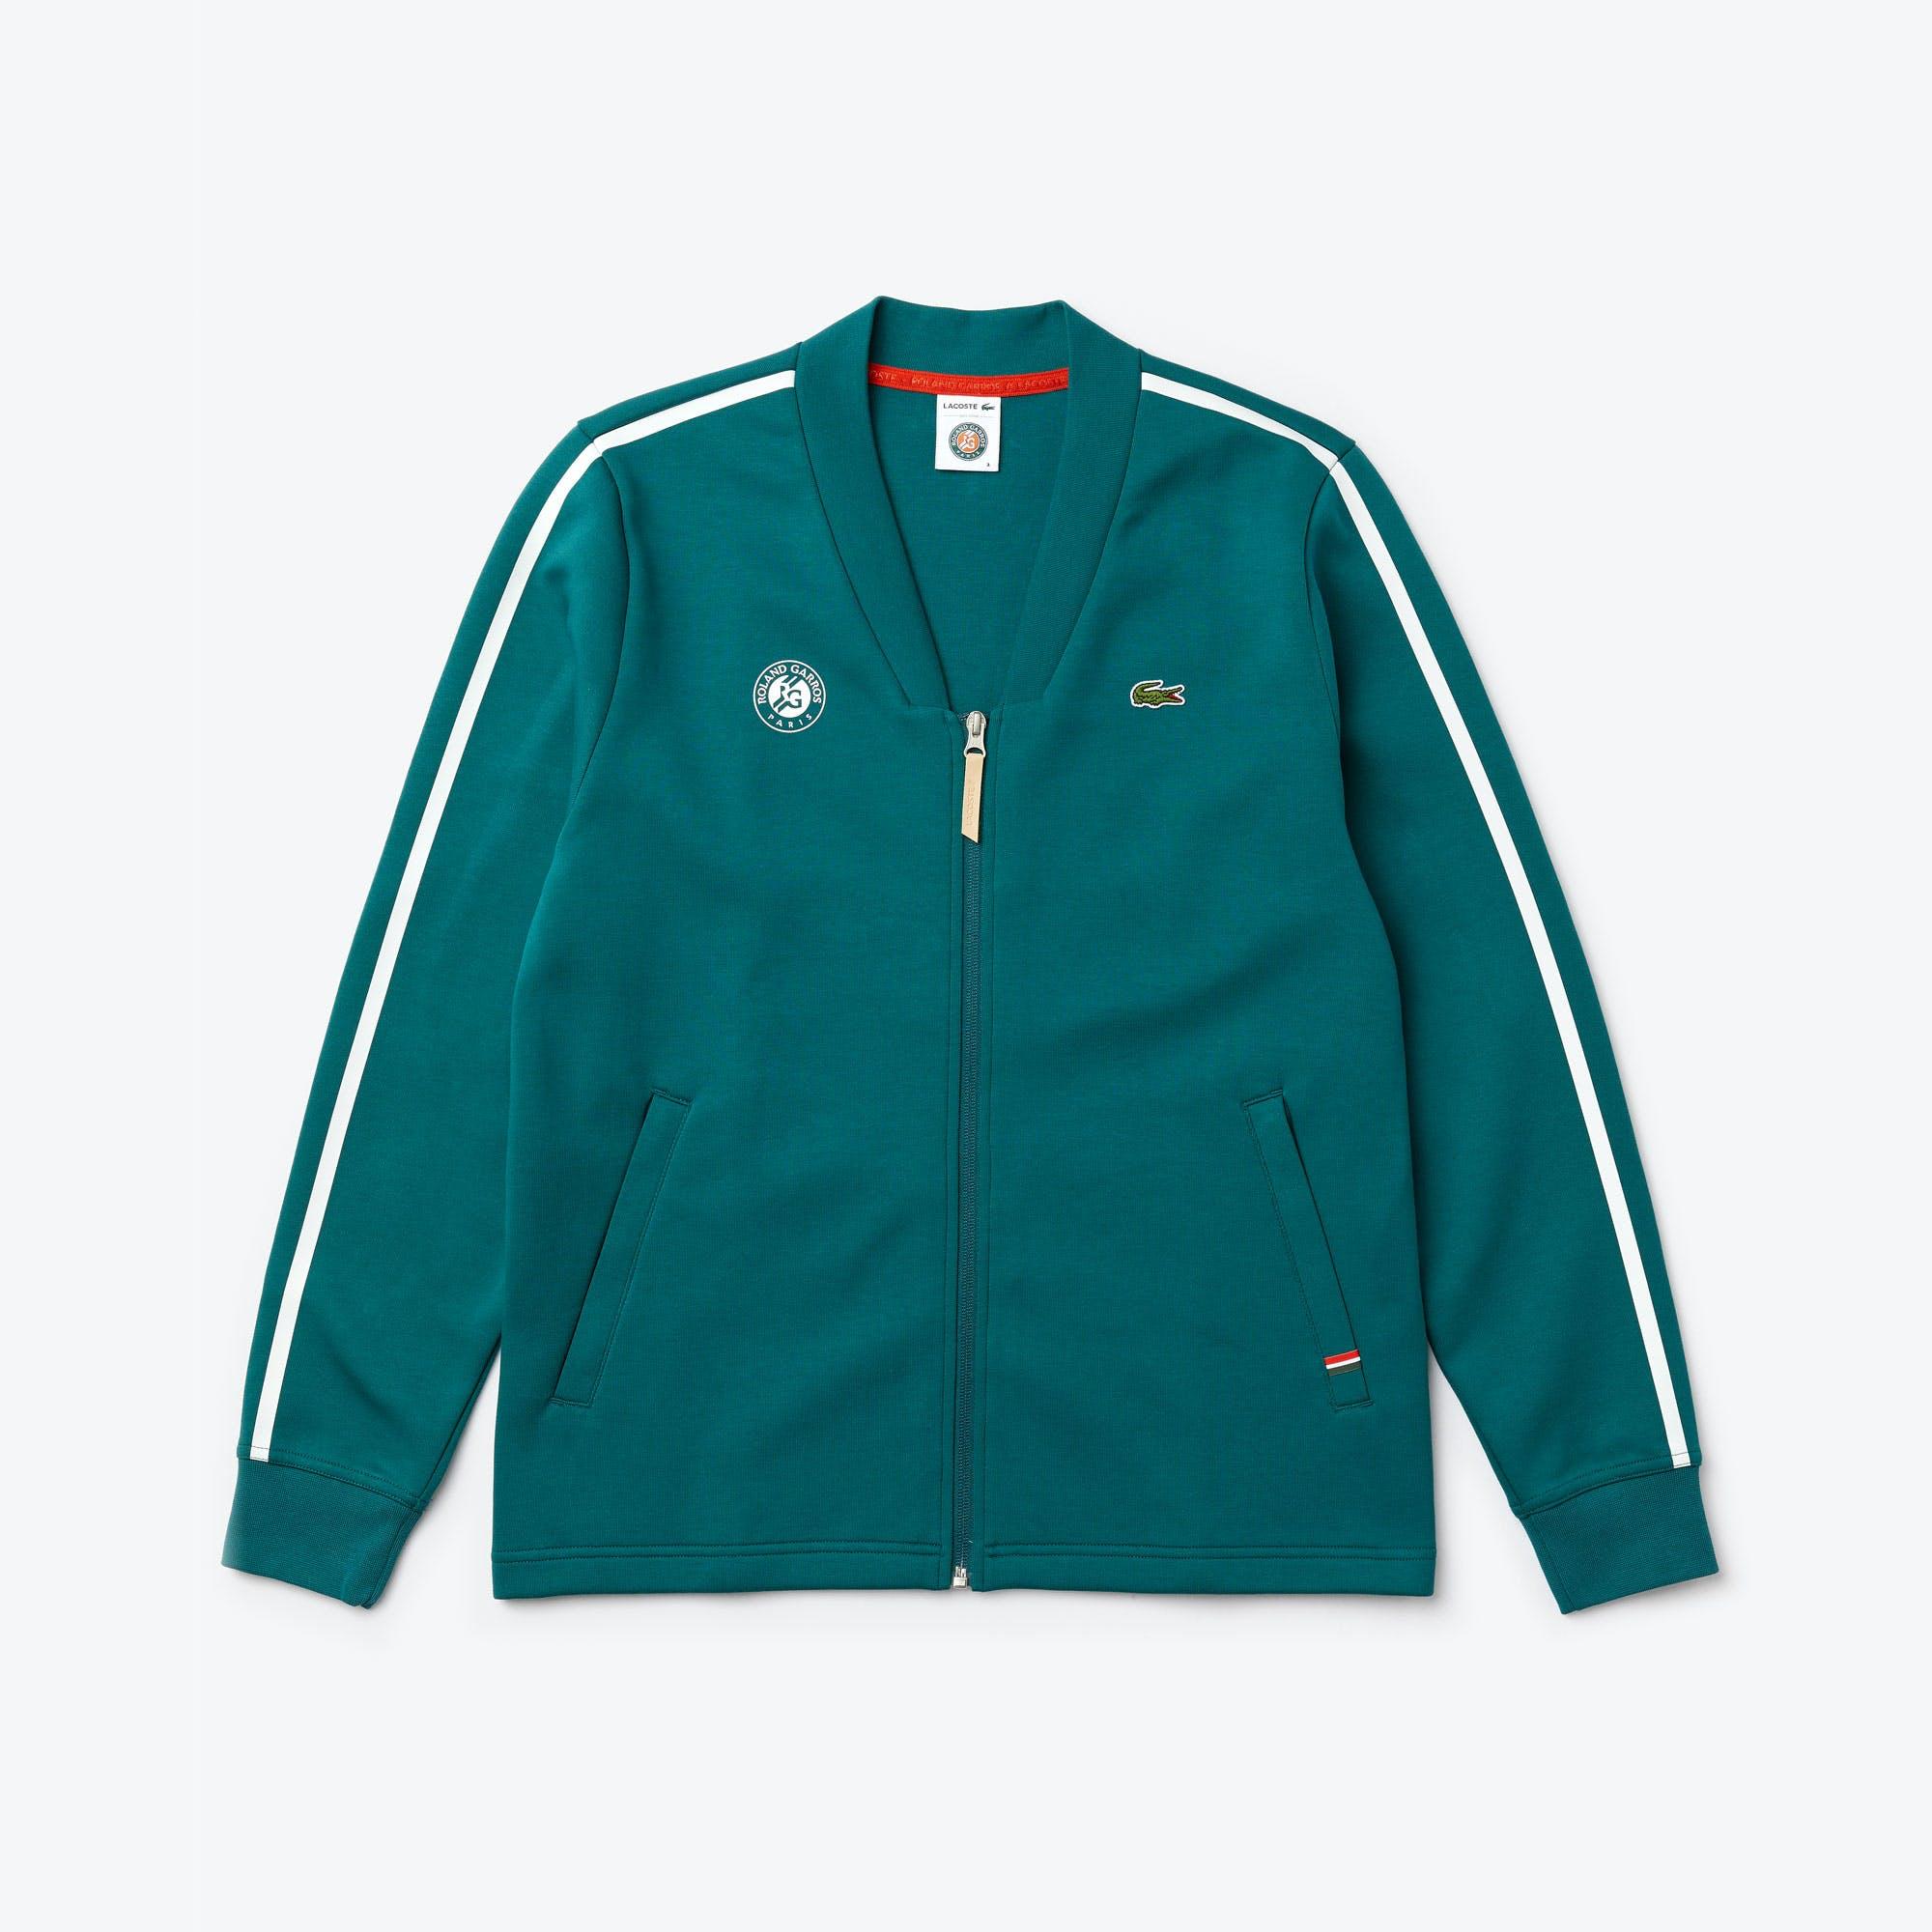 Sweatshirt zippé Lacoste, Roland-Garros, Cardigan